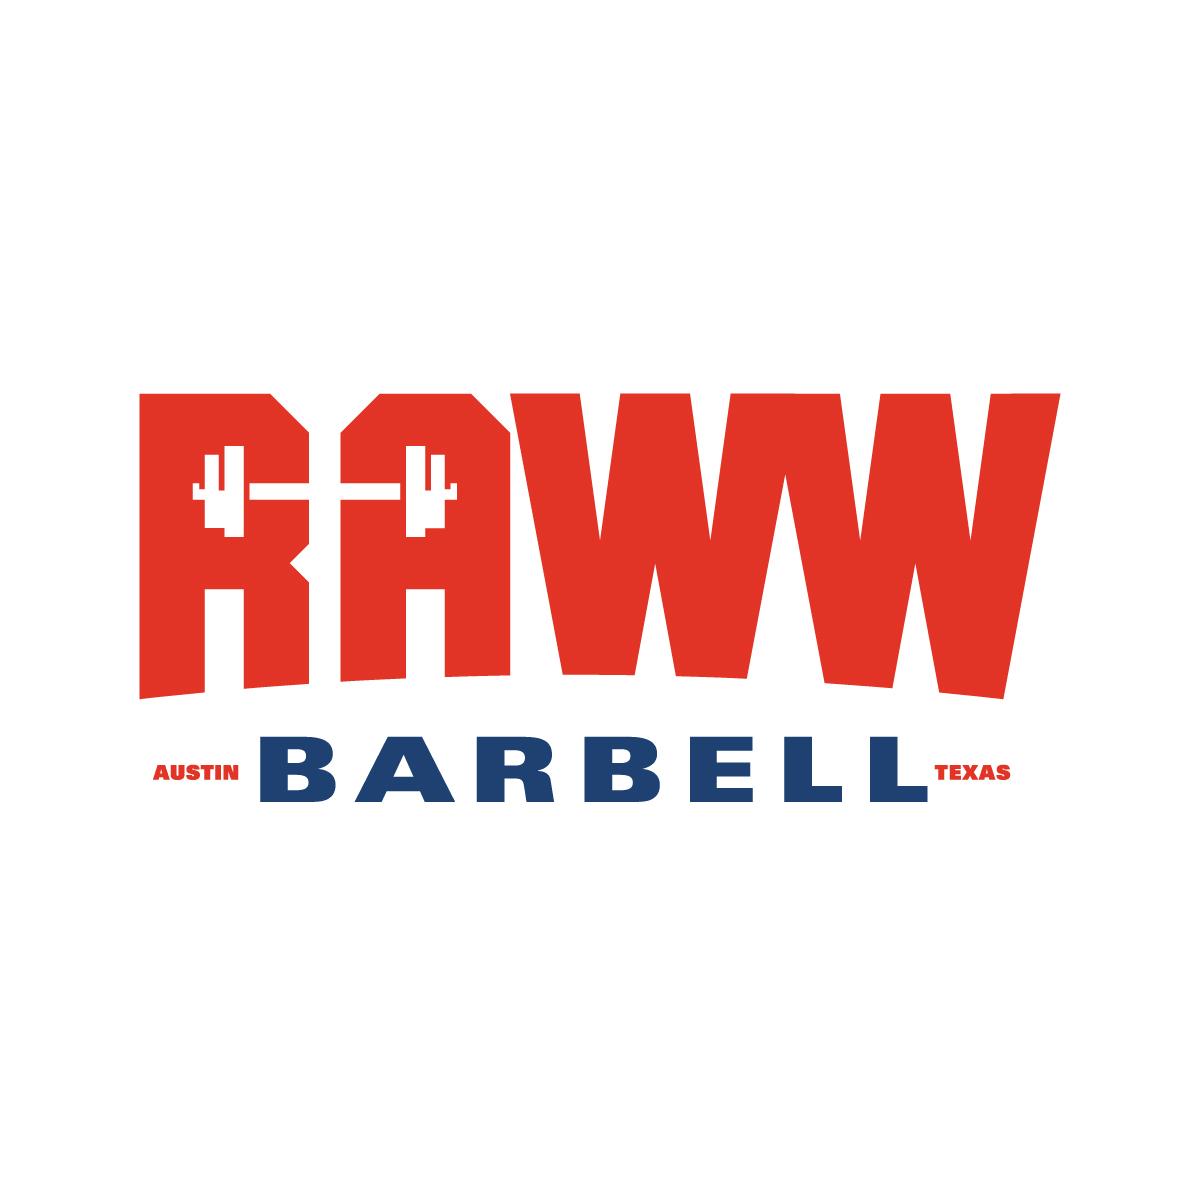 Raww Barbell